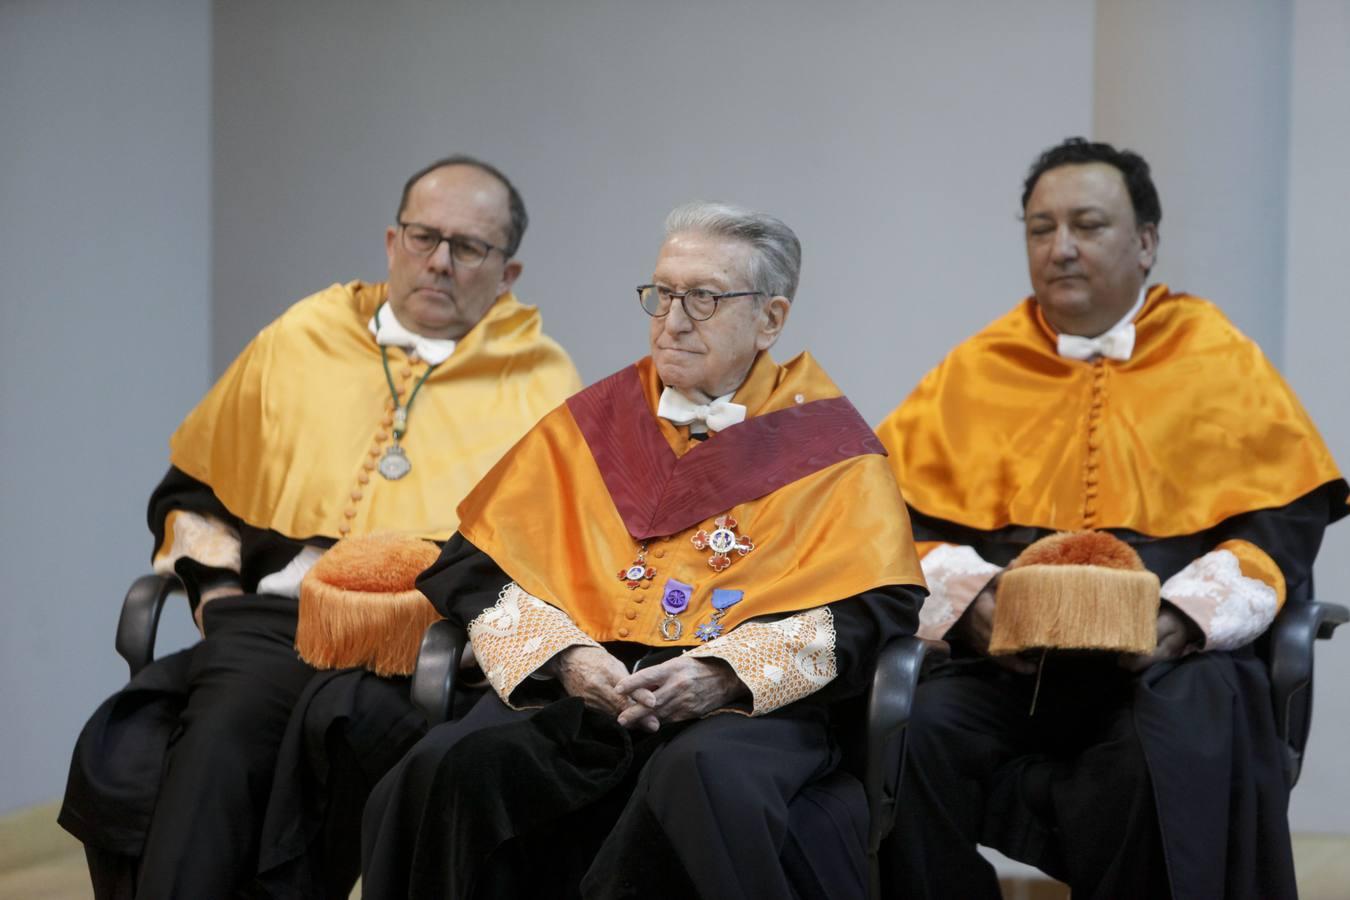 Jaime Gil Aluja investido como Doctor Honoris Causa